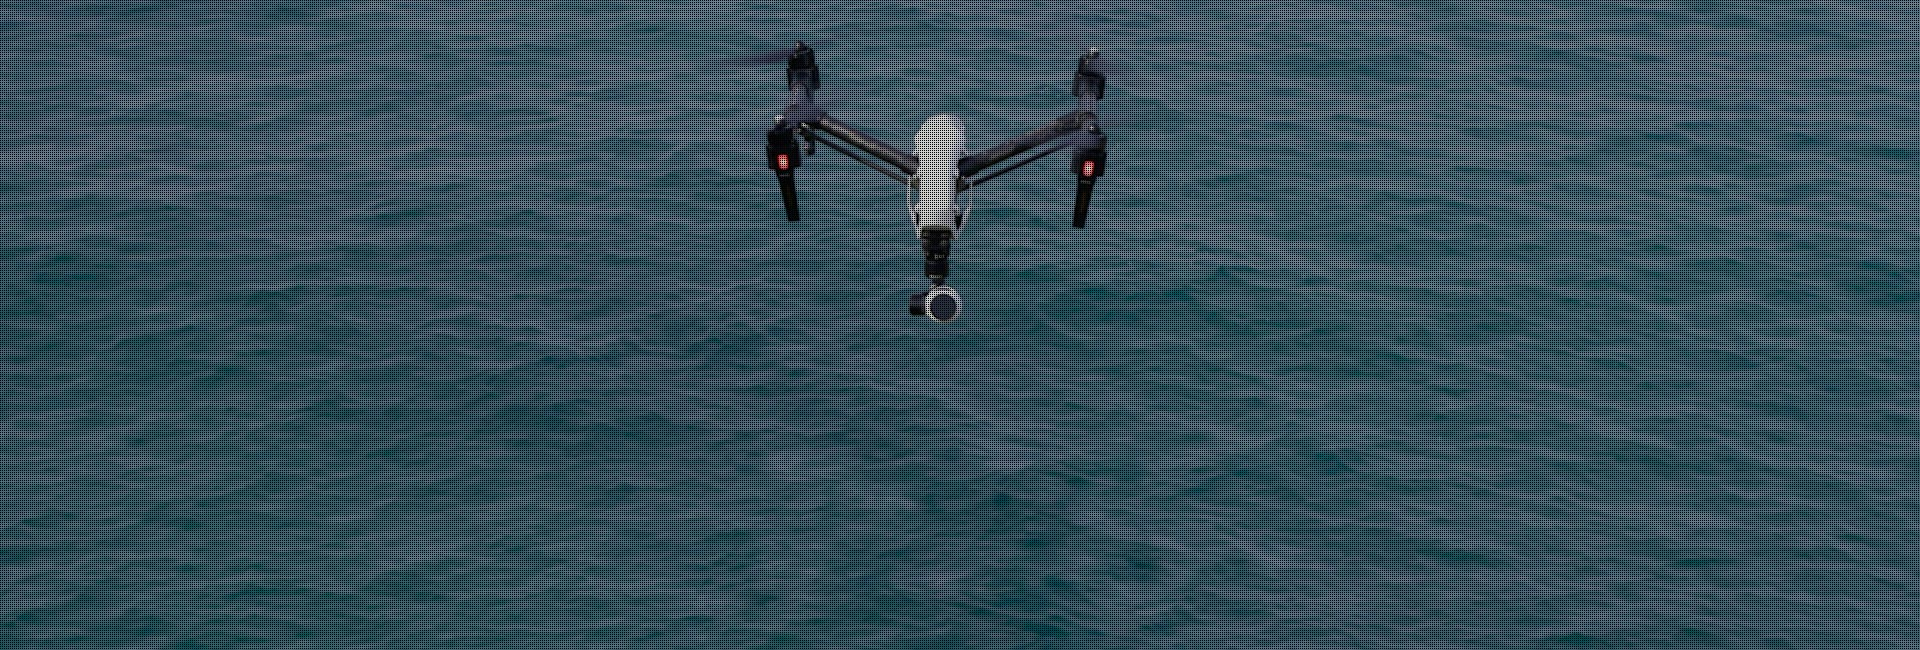 slide-drones-01